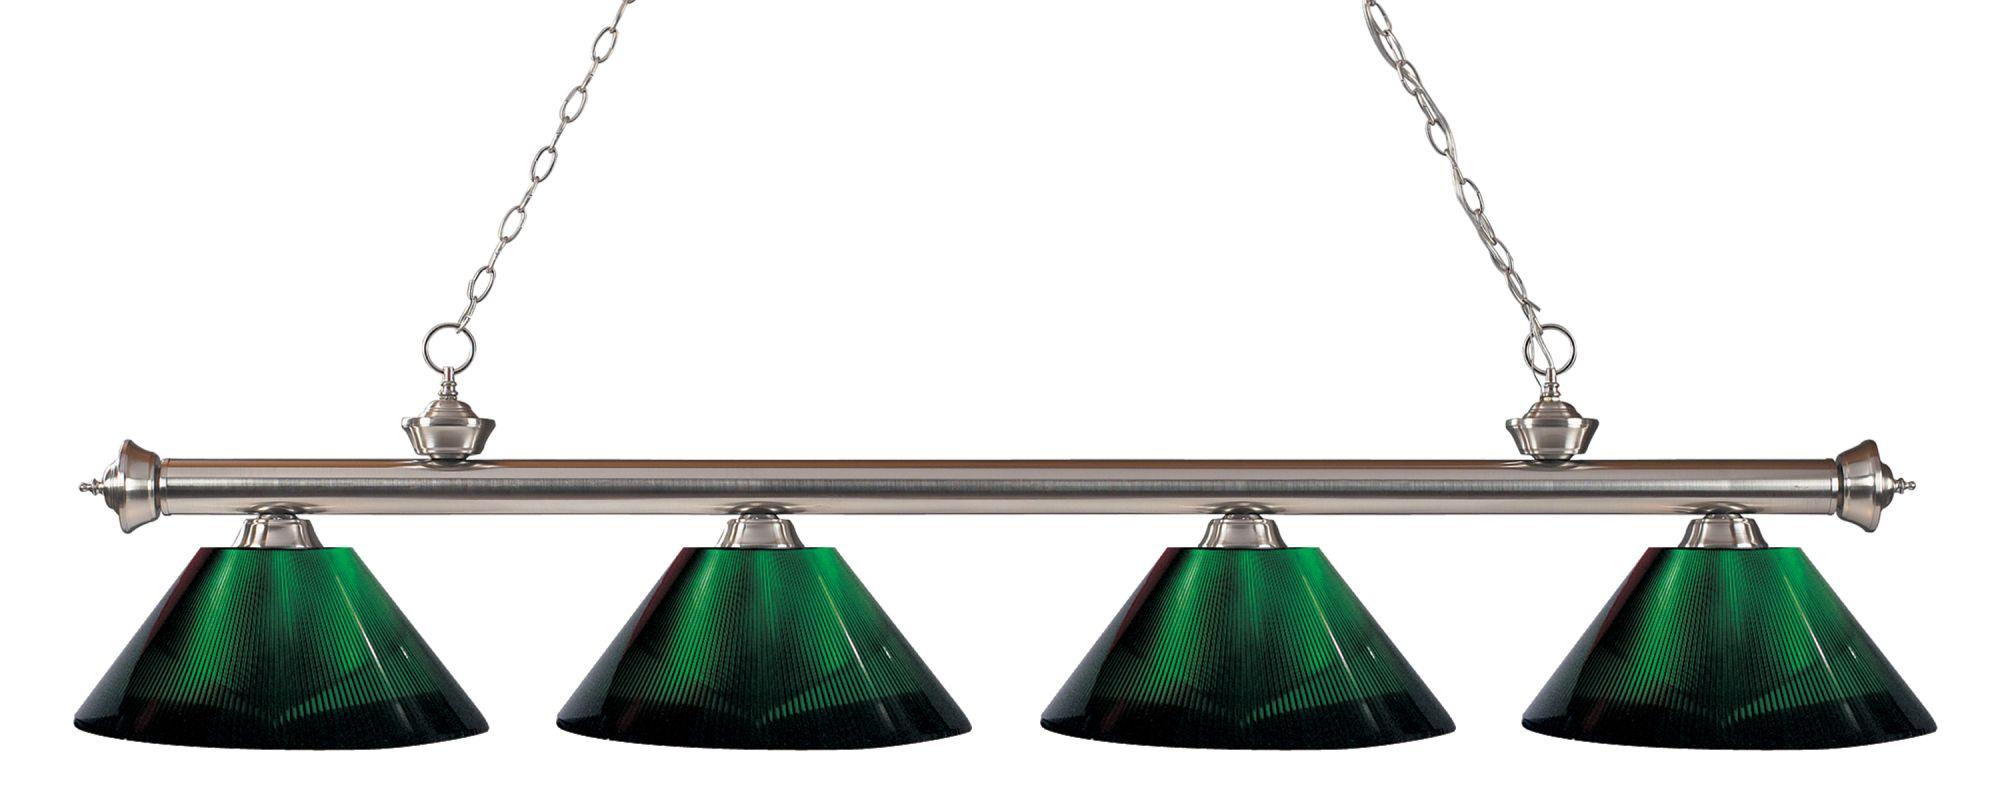 Z-Lite 200-4-ARG Riviera 4 Light Island/Billiard Light with Green Sale $392.00 ITEM: bci2564593 ID#:200-4BN-ARG UPC: 685659041187 :